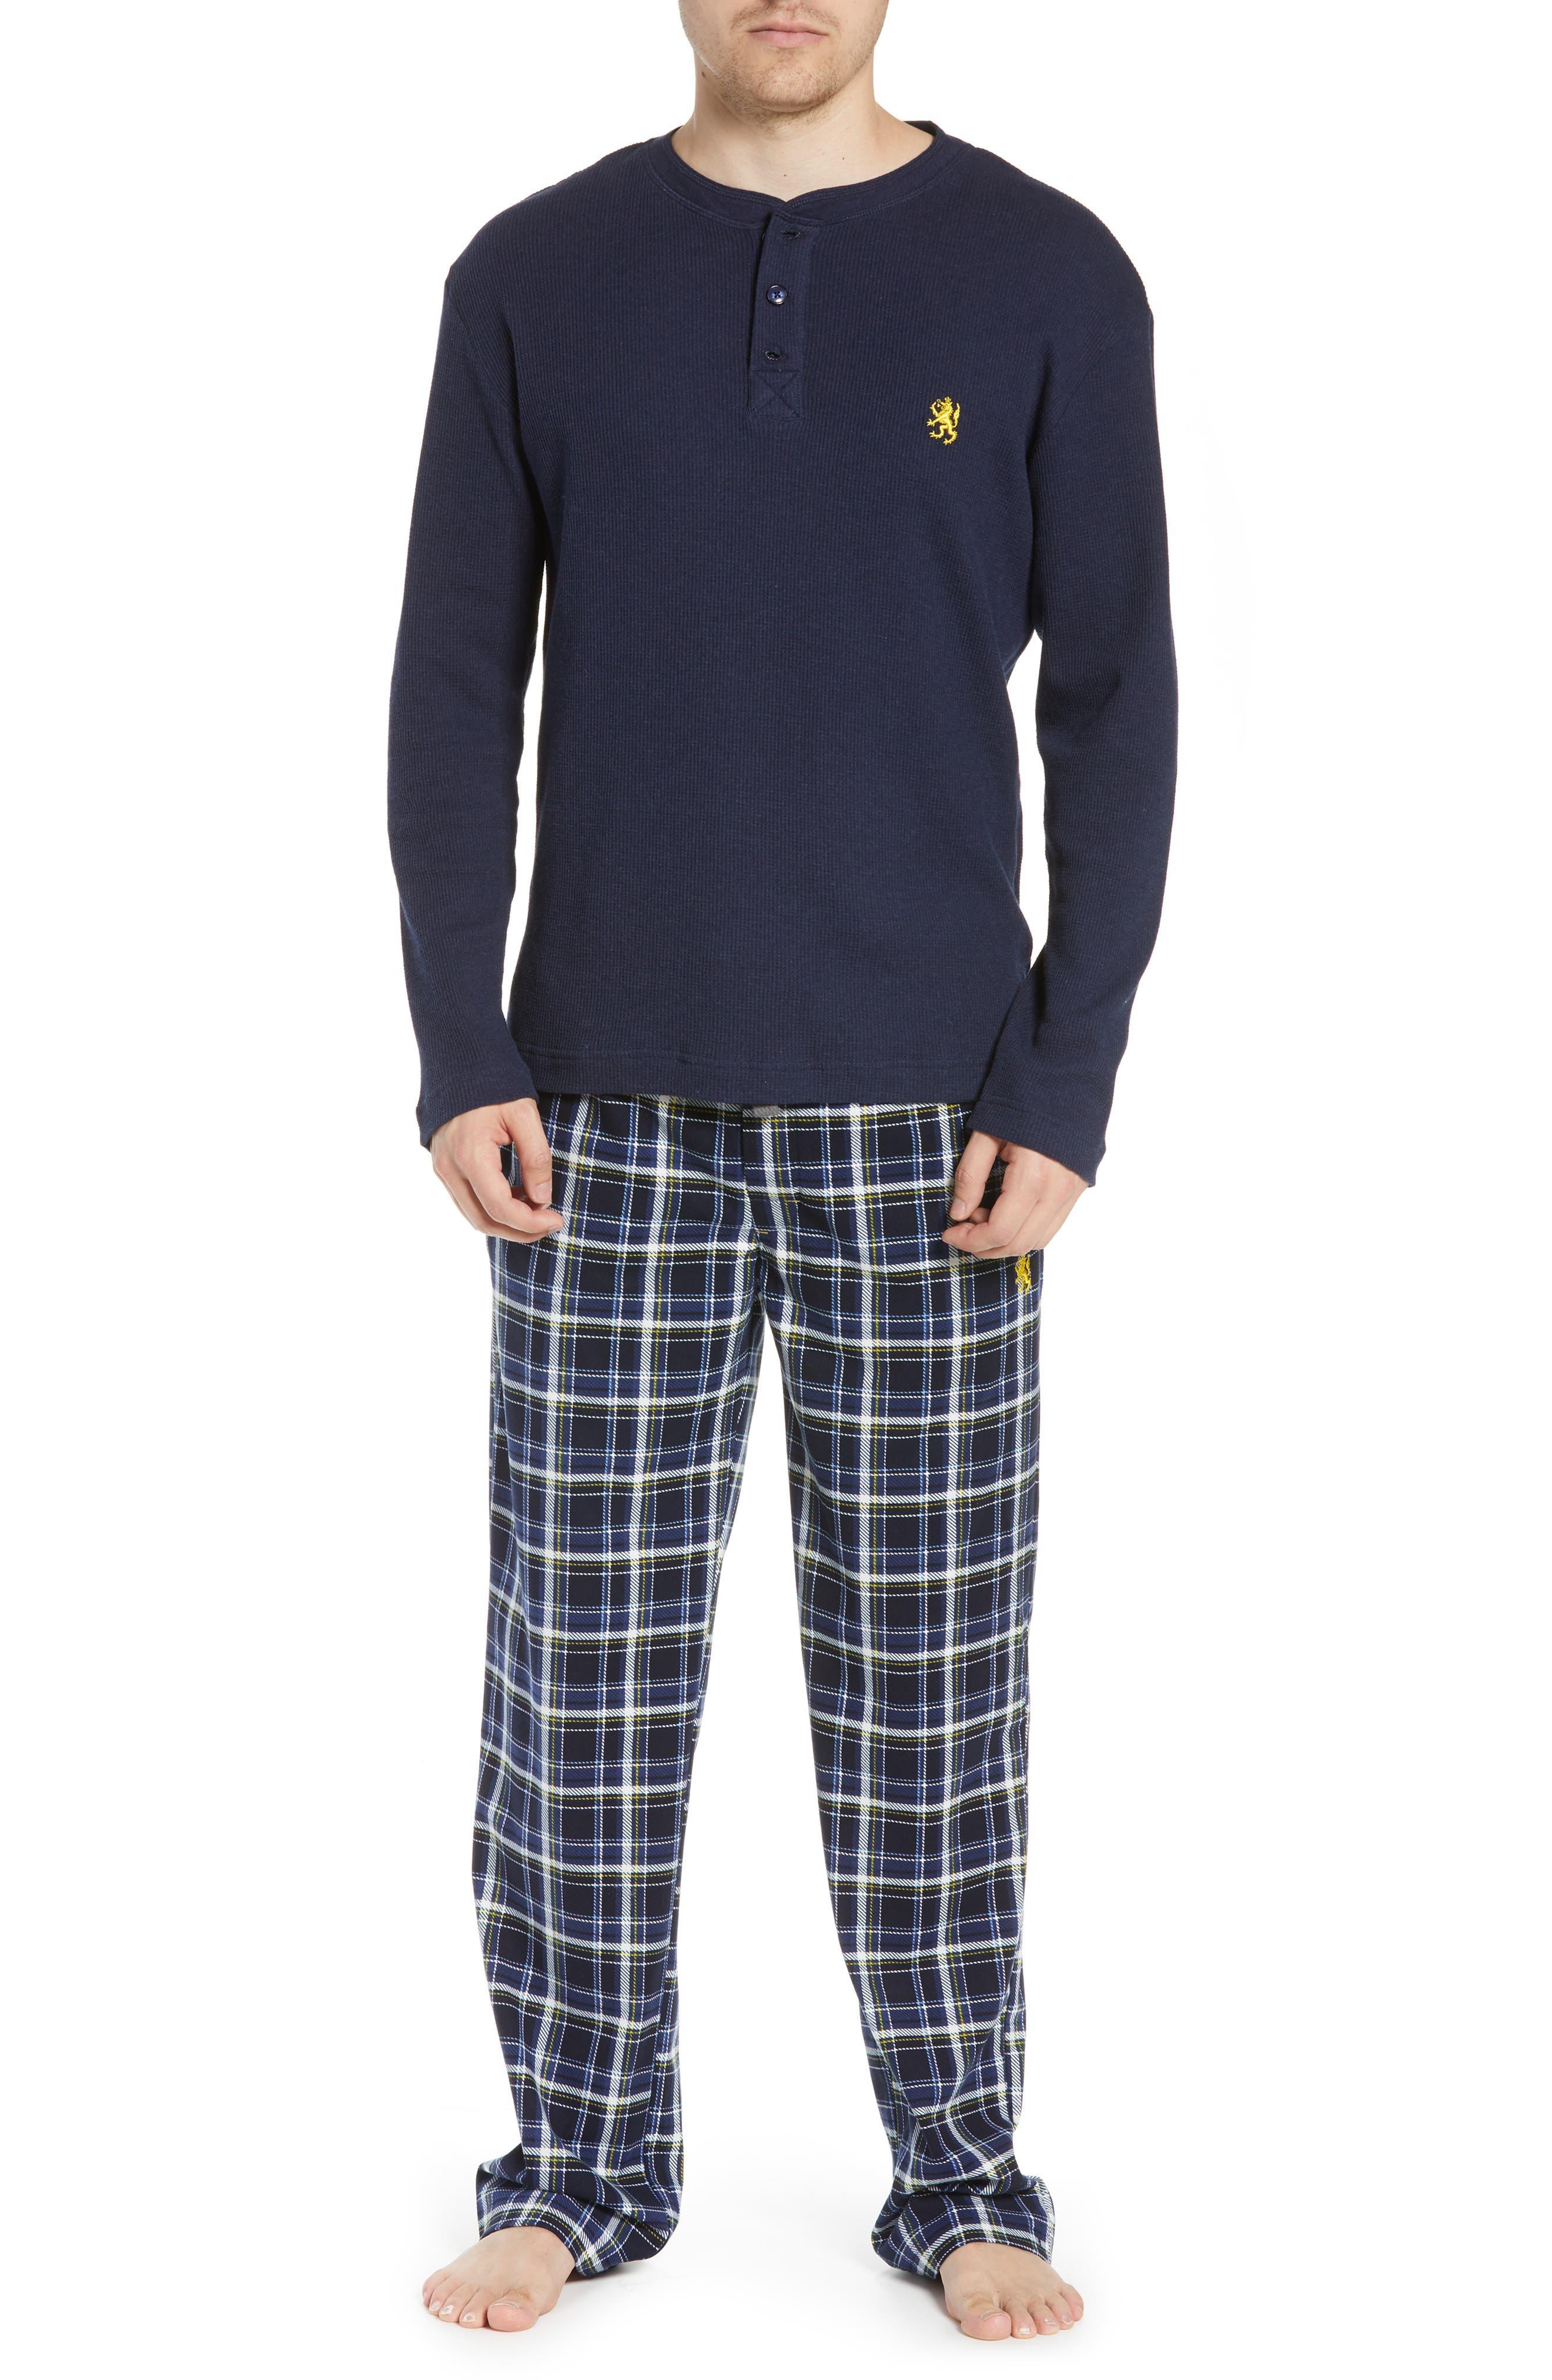 MAJESTIC INTERNATIONAL Take It Outside 2-Piece Pajamas, Main, color, BLUE